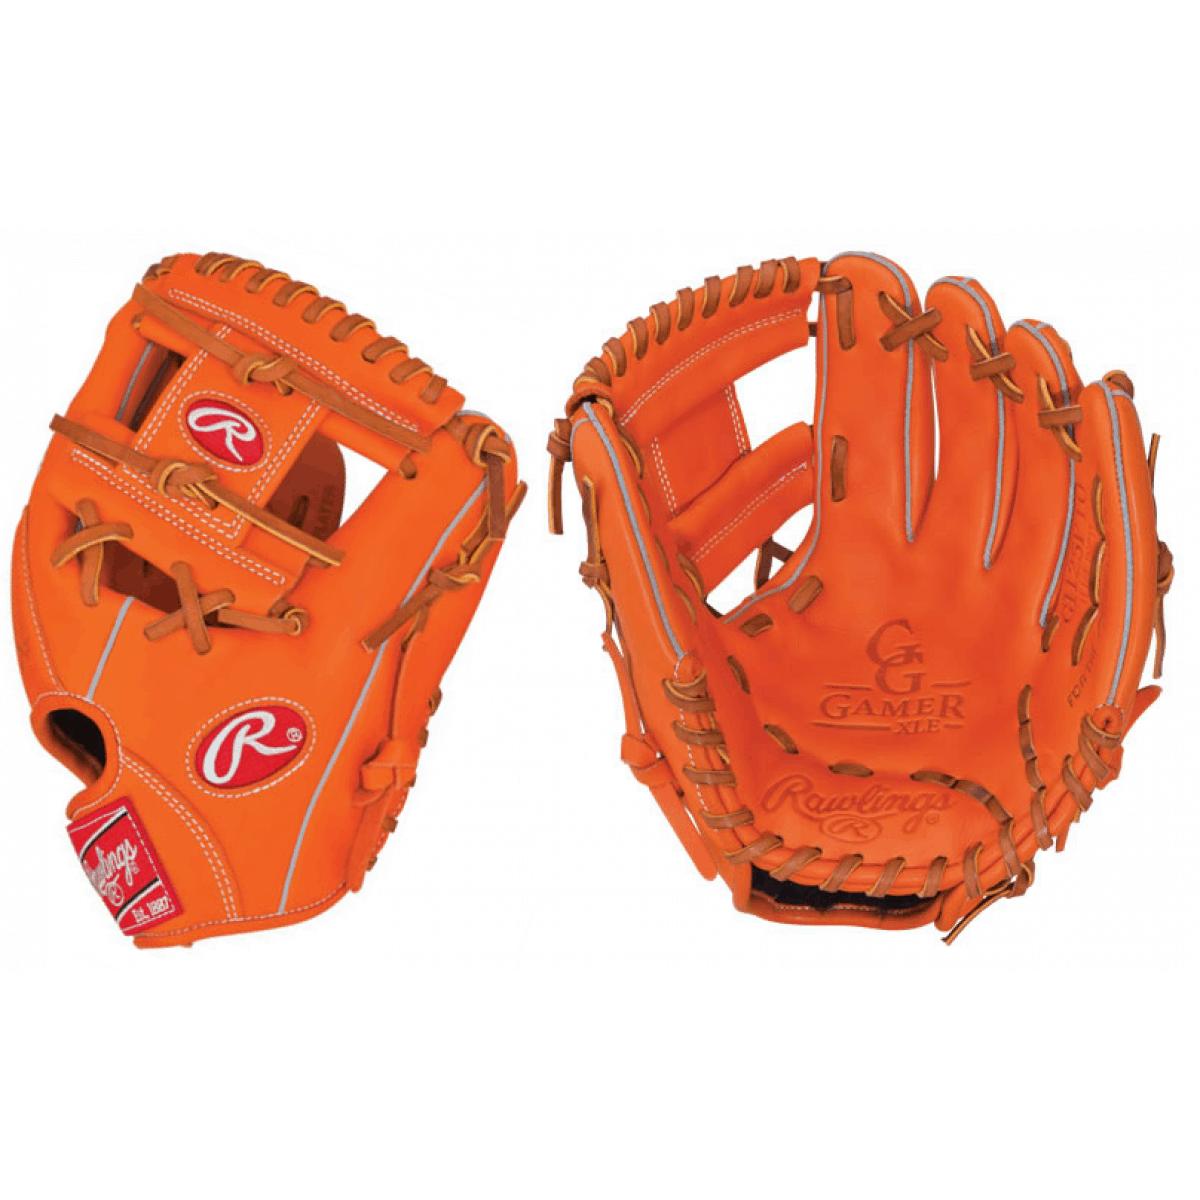 Best All Around Baseball Gloves